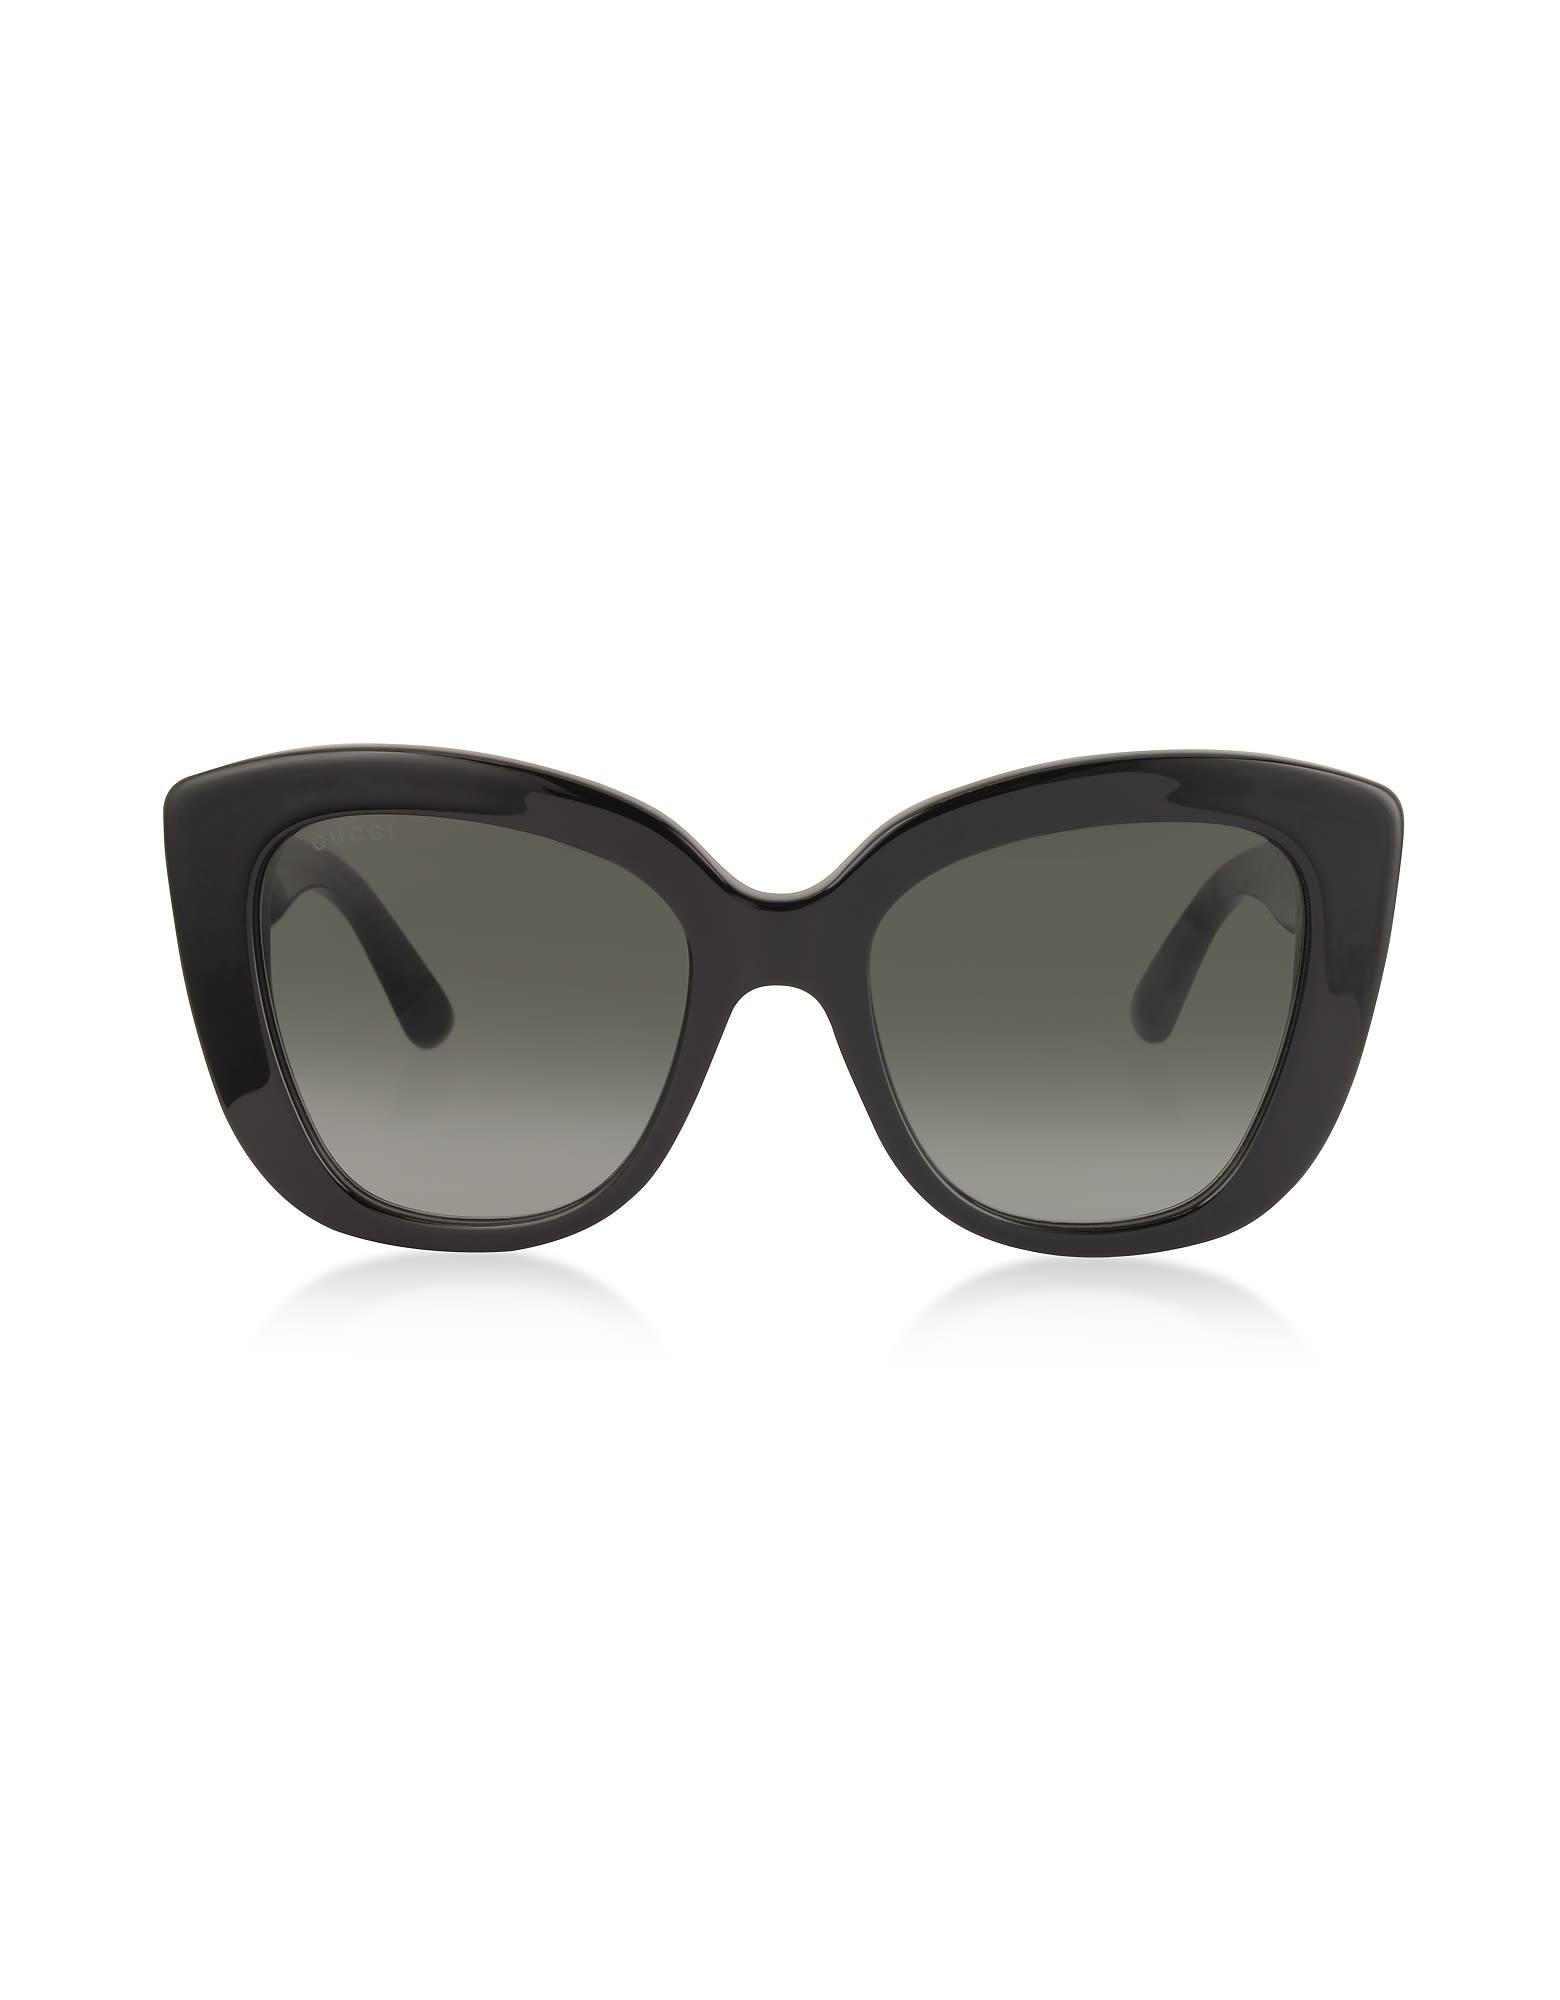 4489a1274b8 Gucci Oversized Rectangular-Frame Acetate Sunglasses In Black Gray ...